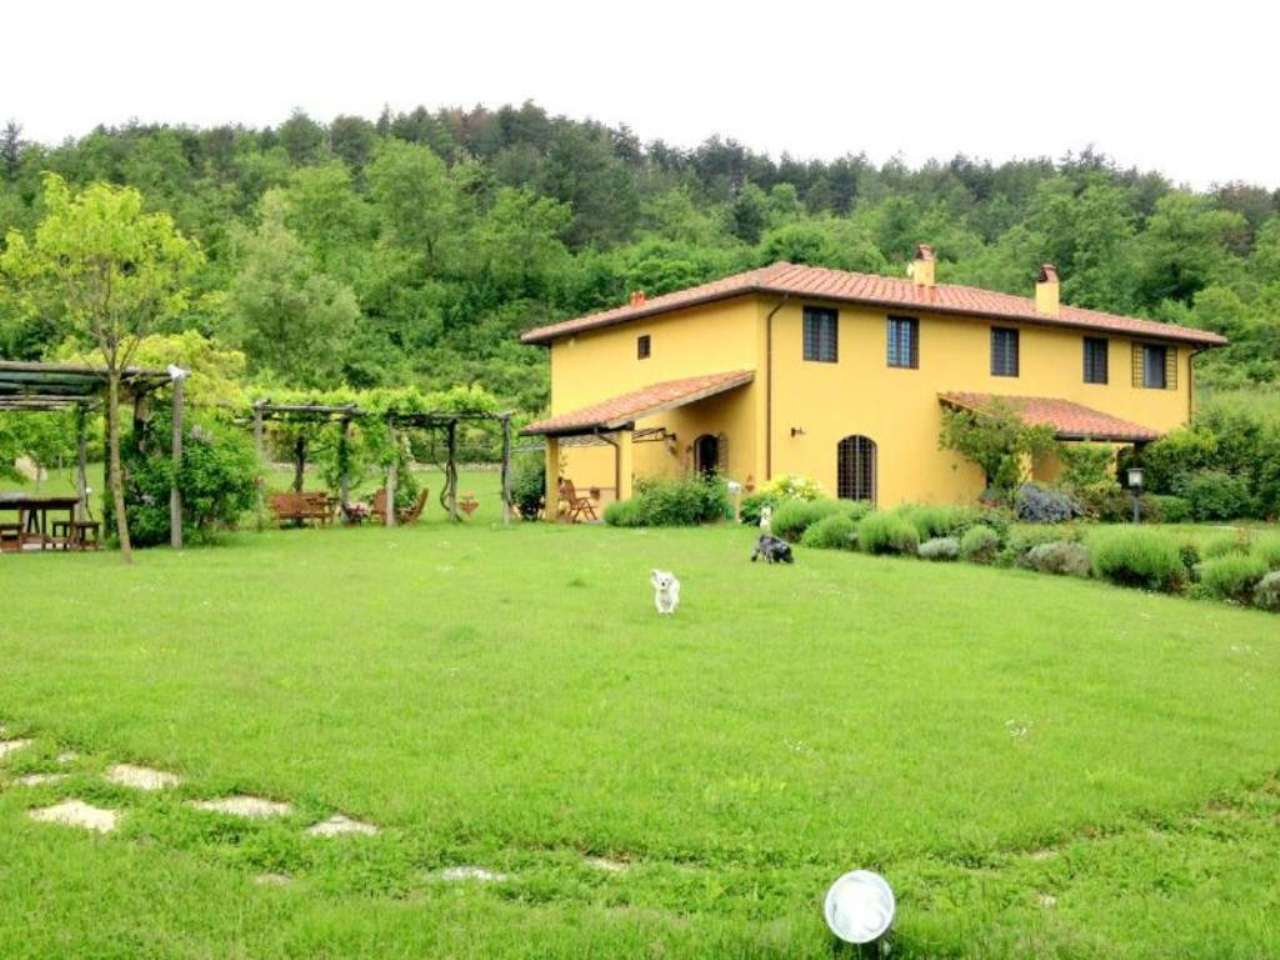 Vendita case e appartamenti a pontassieve for Case in vendita pontassieve